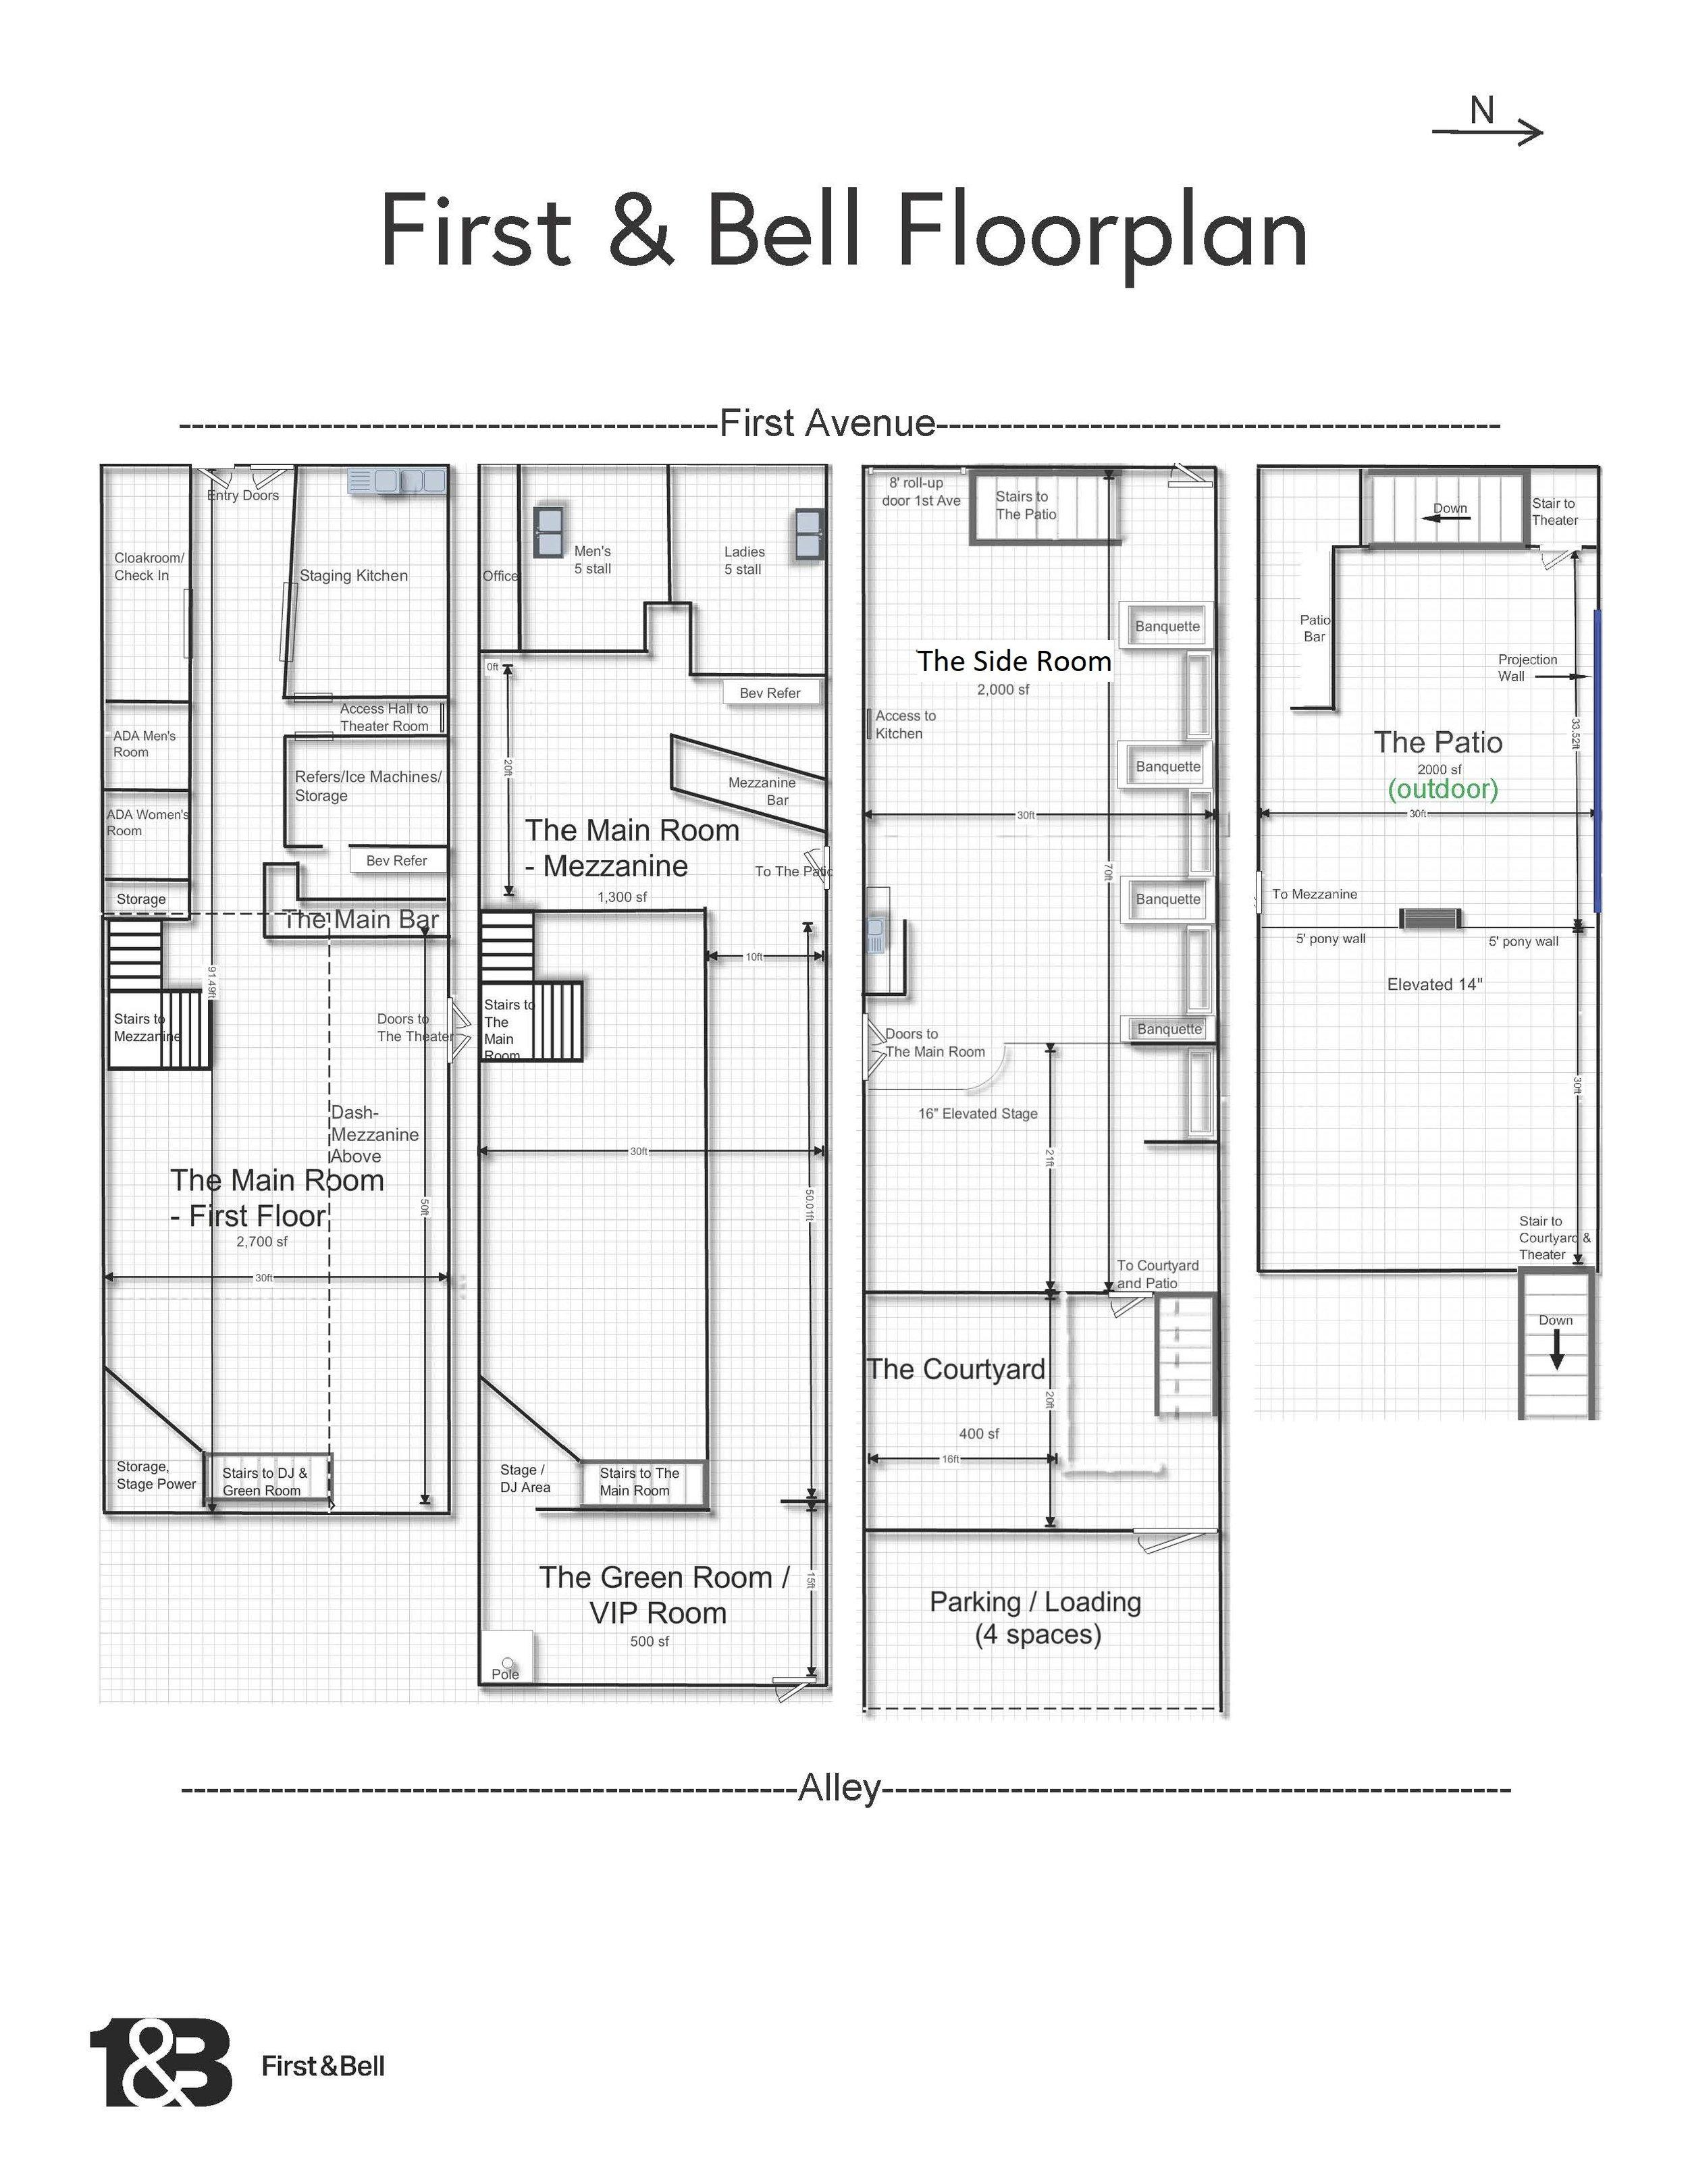 First and Bell Floorplan (all) SideRoom.jpg